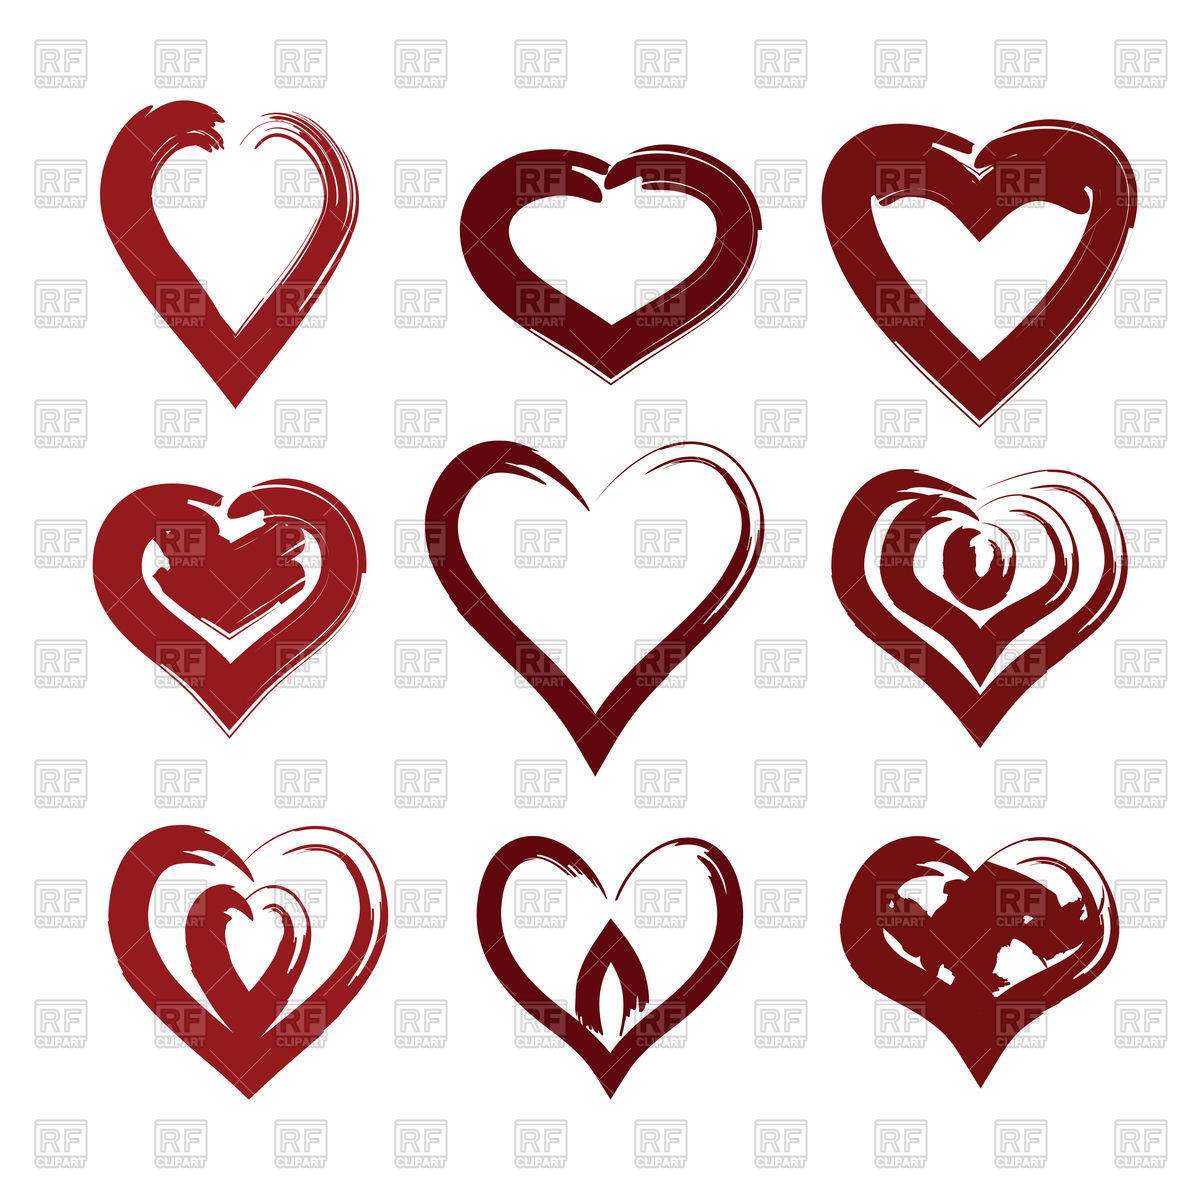 1200x1200 Creative Heart Symbol Royalty Free Vector Clip Art Image